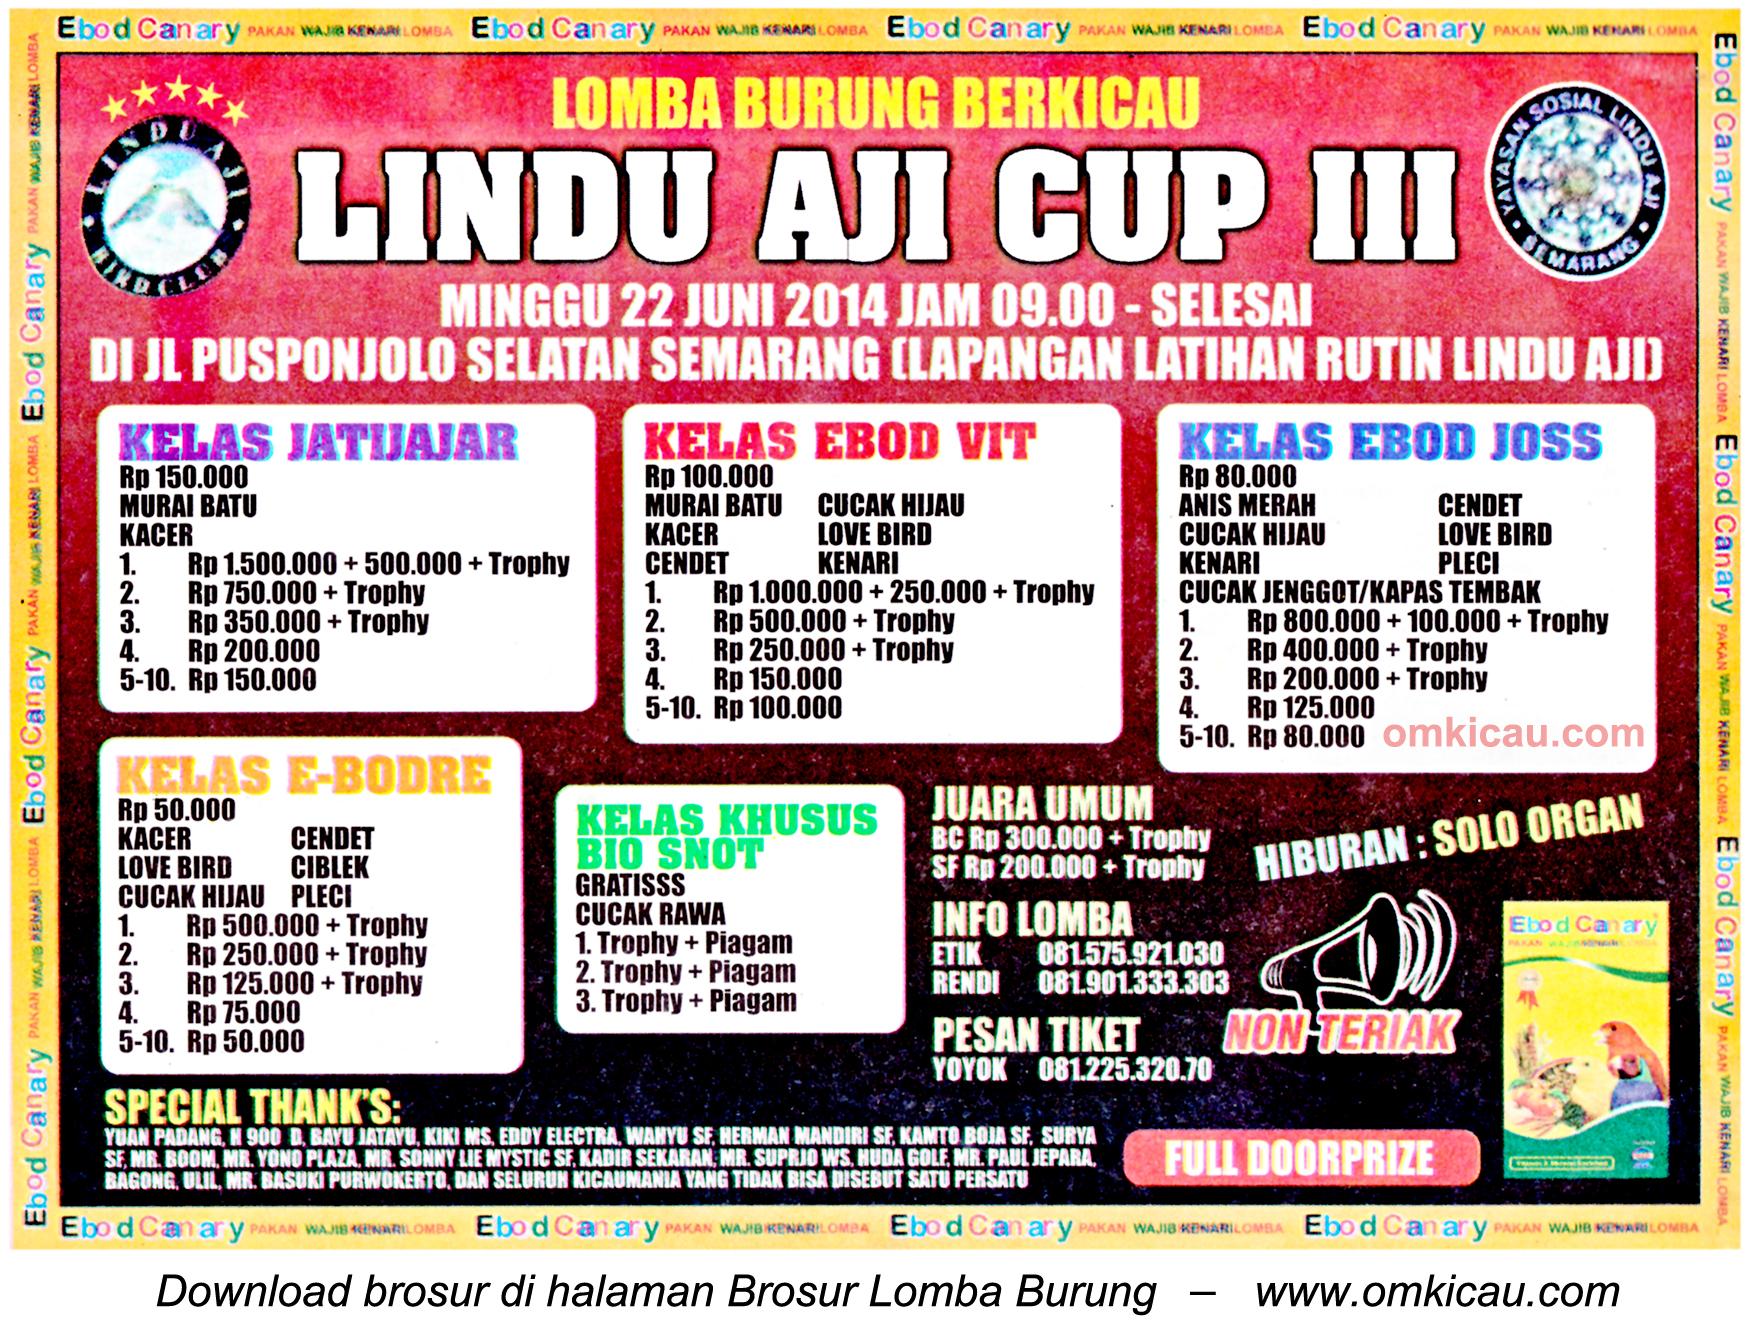 Brosur Lomba Burung Berkicau Lindu Aji Cup III, Semarang, 22 Juni 2014